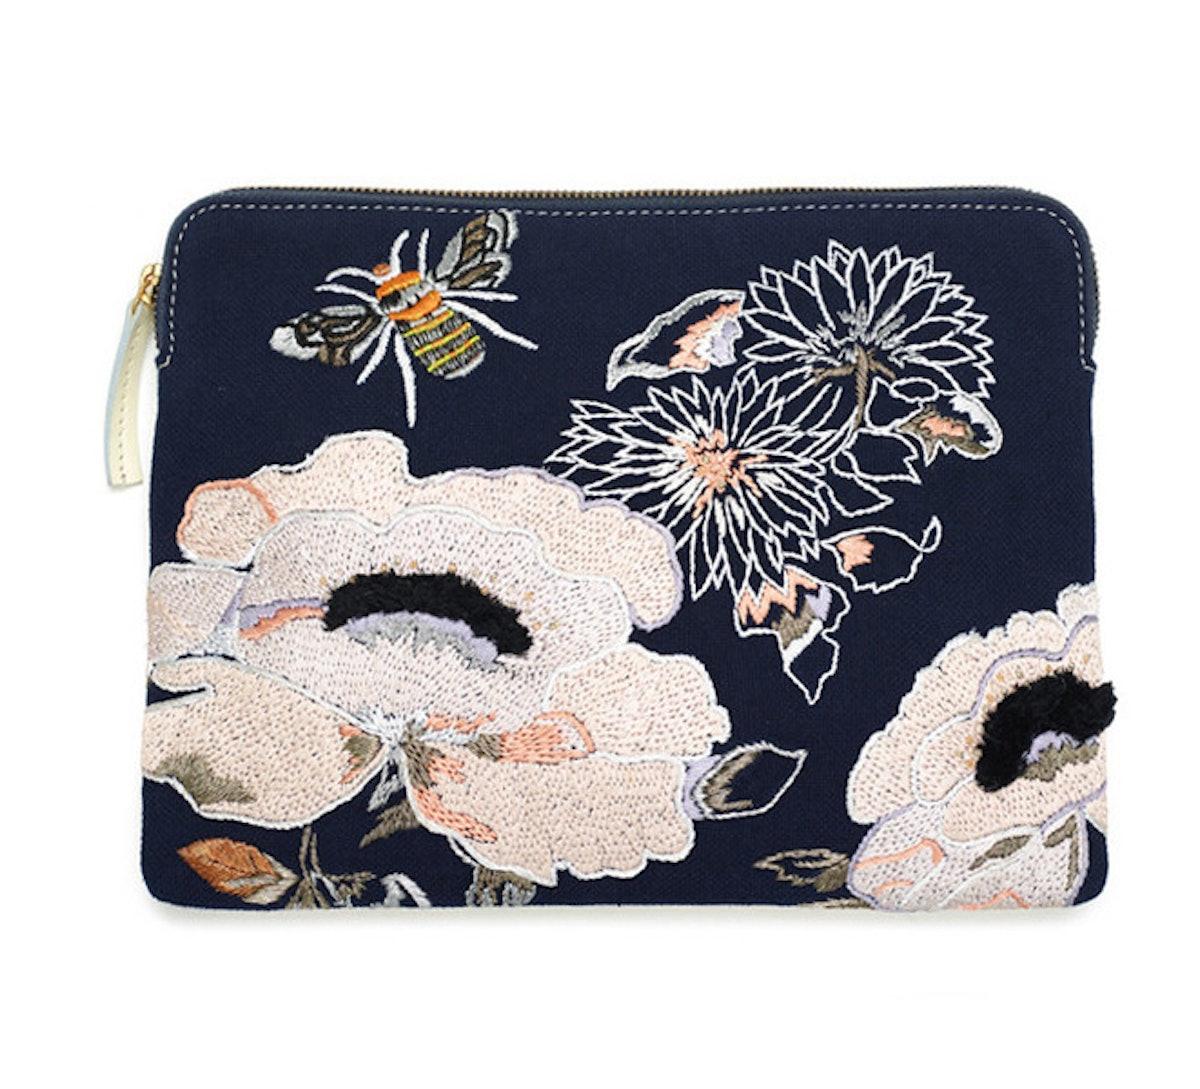 Lizzie Fortunato bag